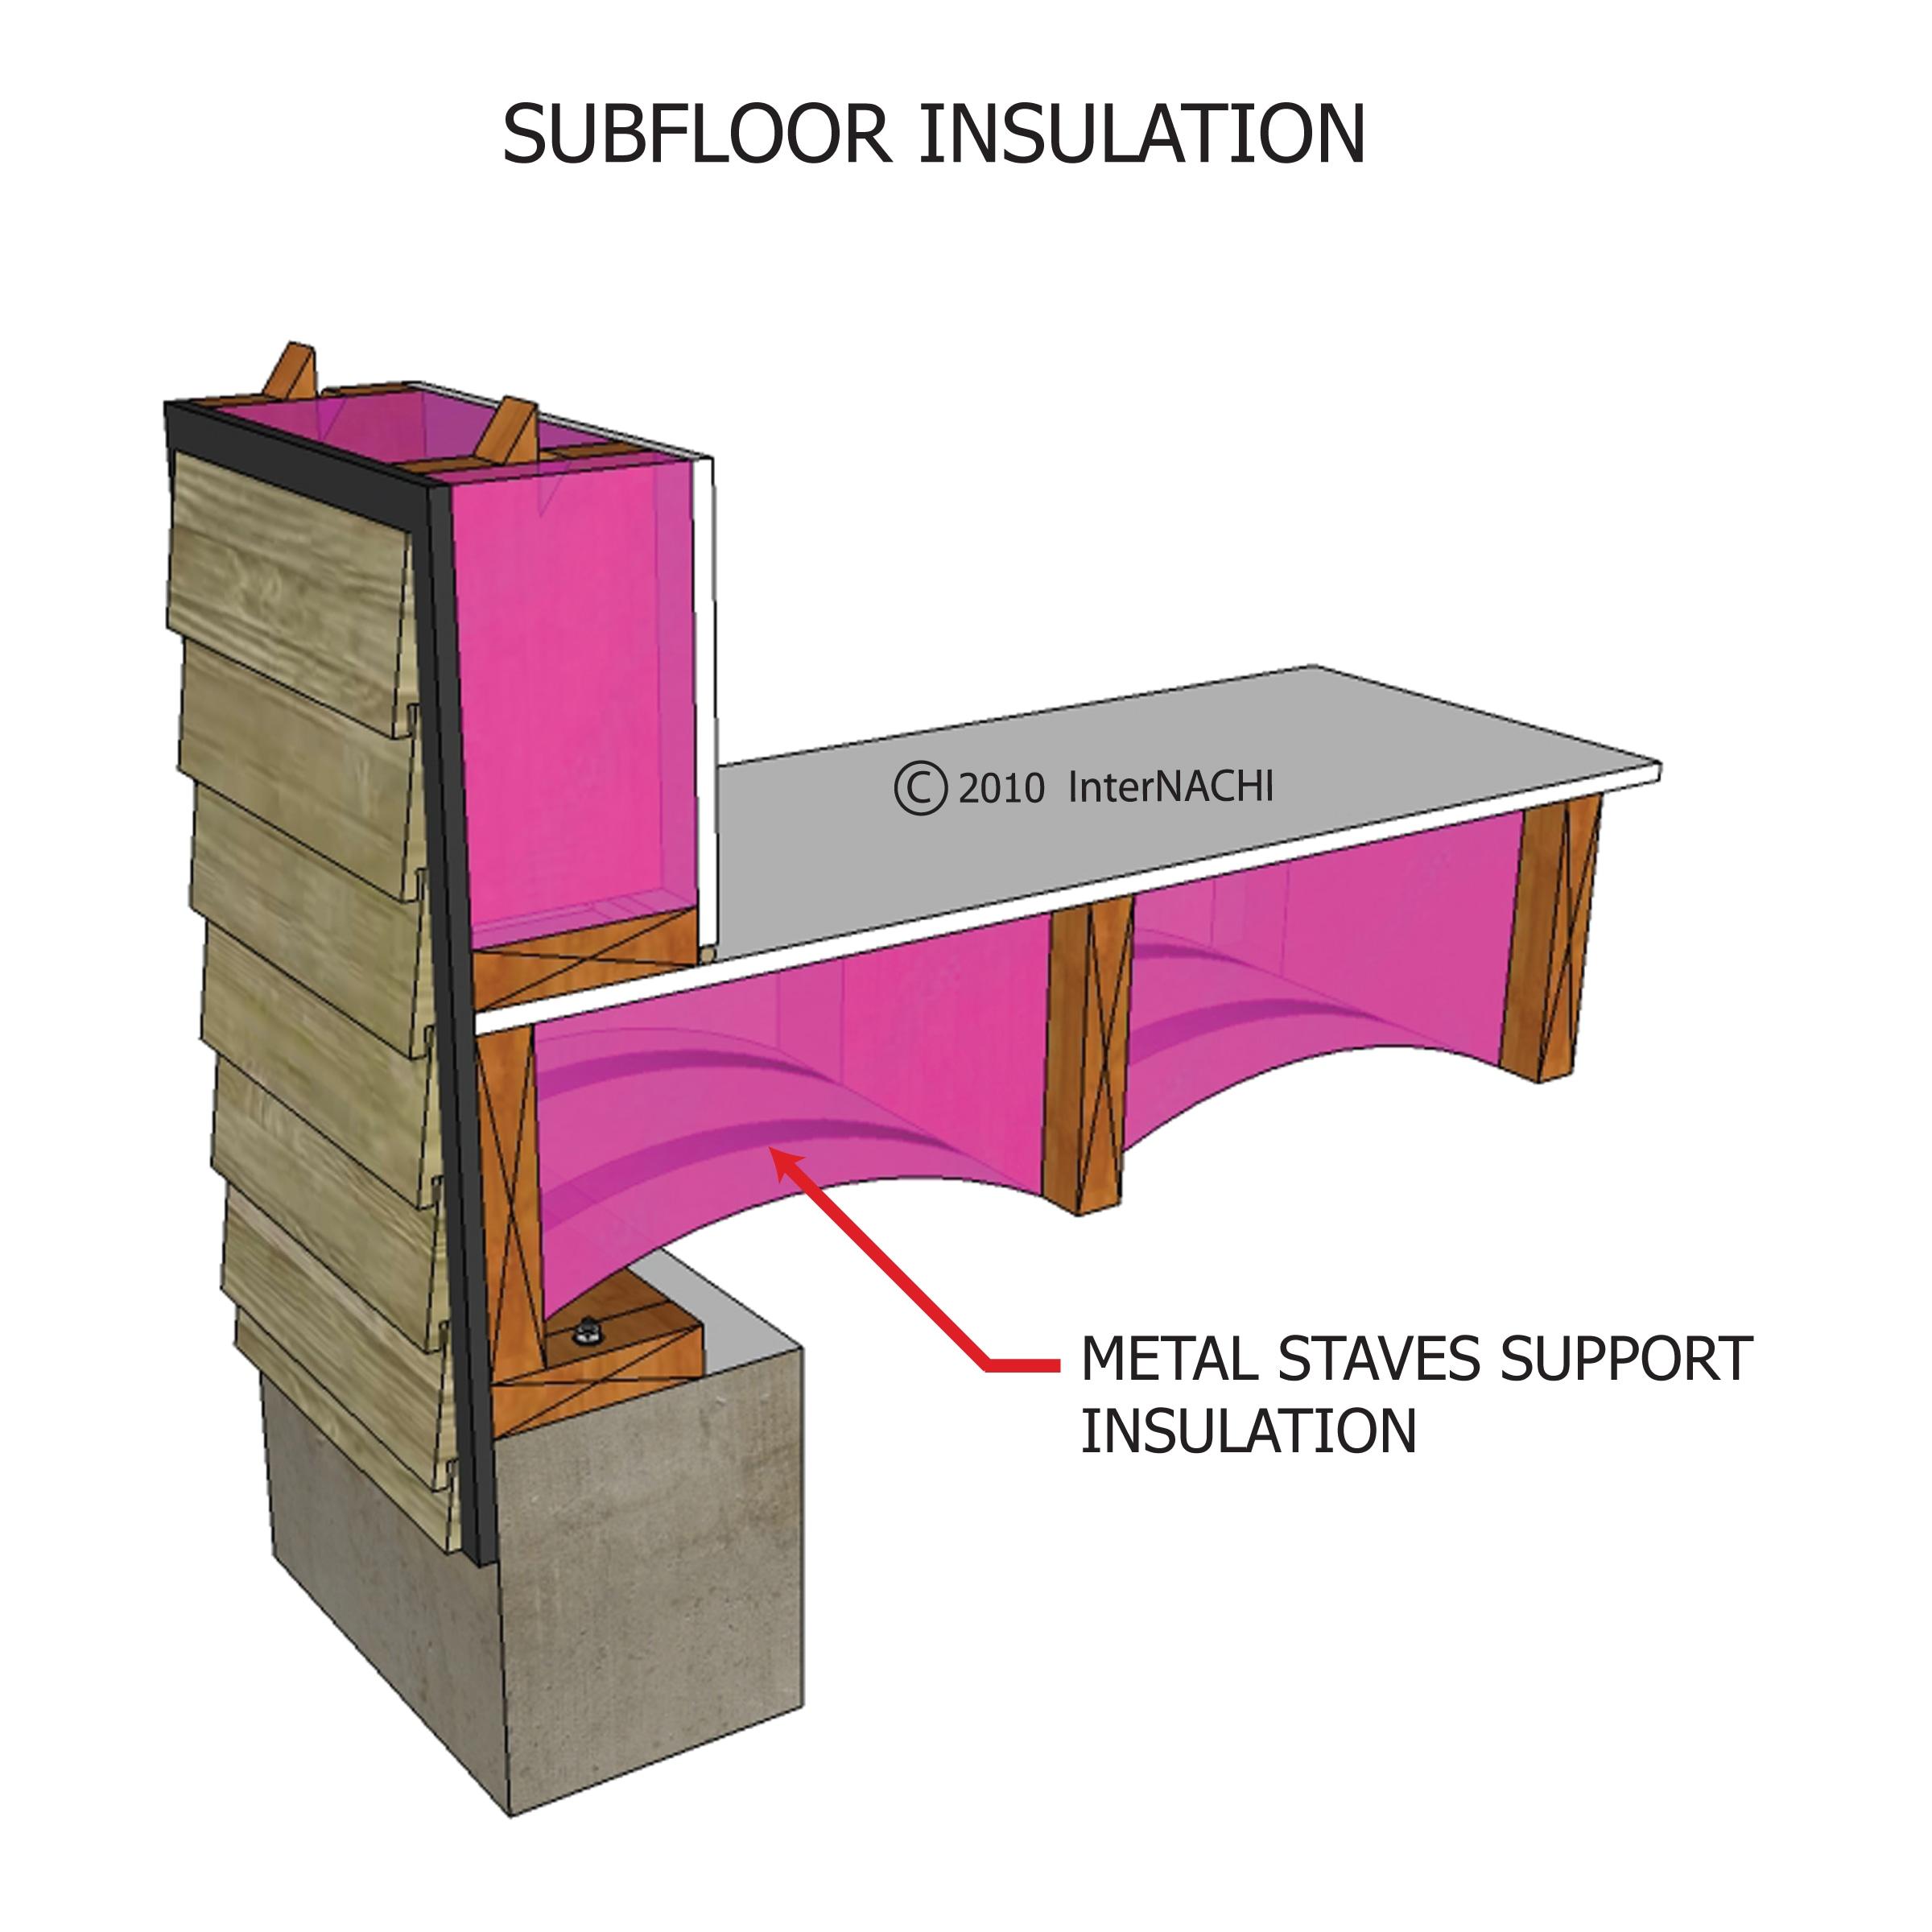 Subfloor insulation.